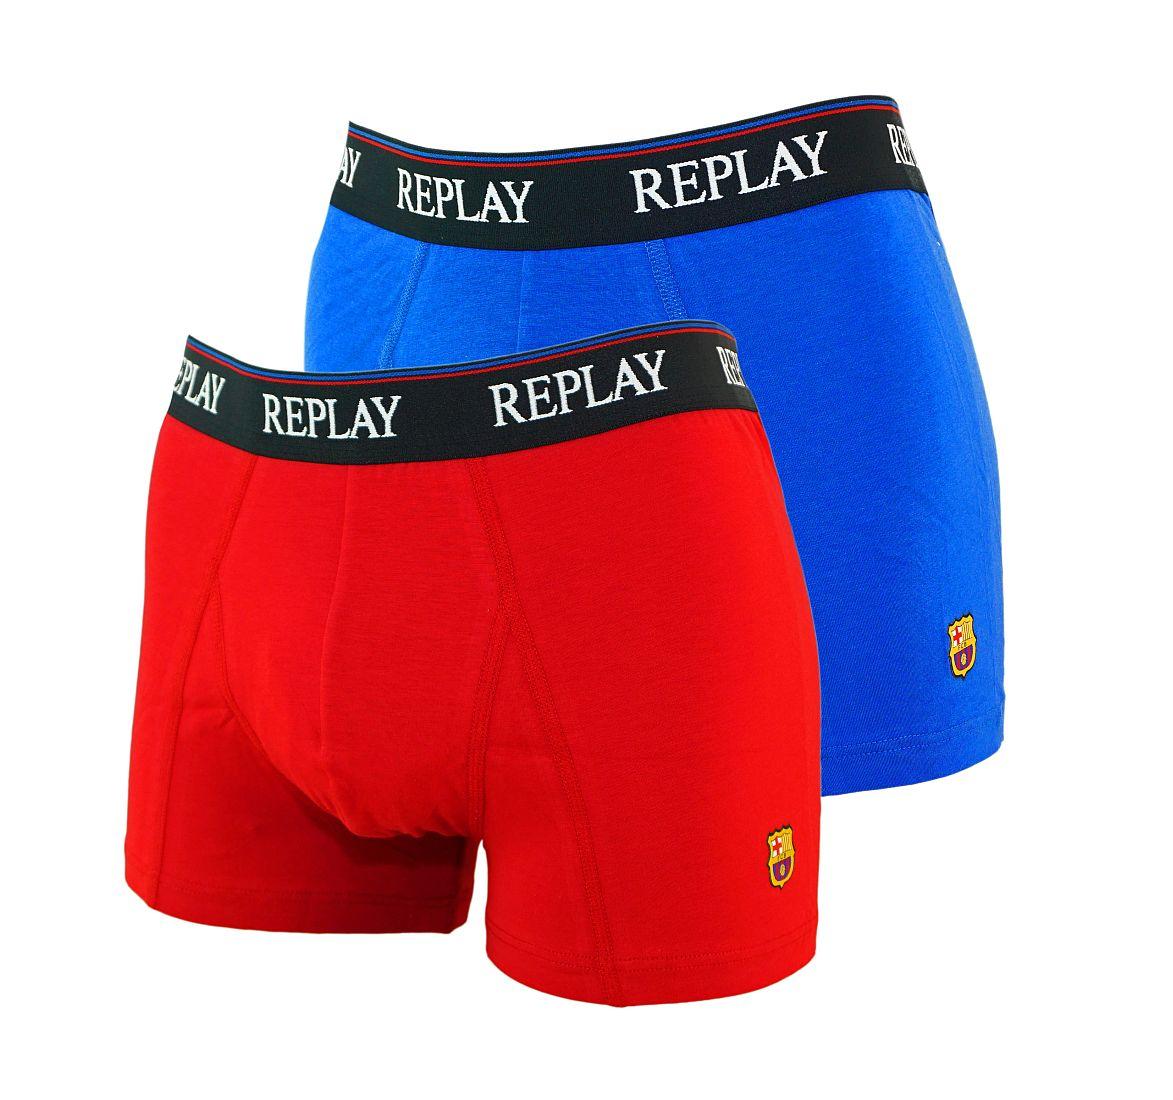 REPLAY 2er Pack Shorts Unterhosen Trunks M251143 B18 FS17-RPS1